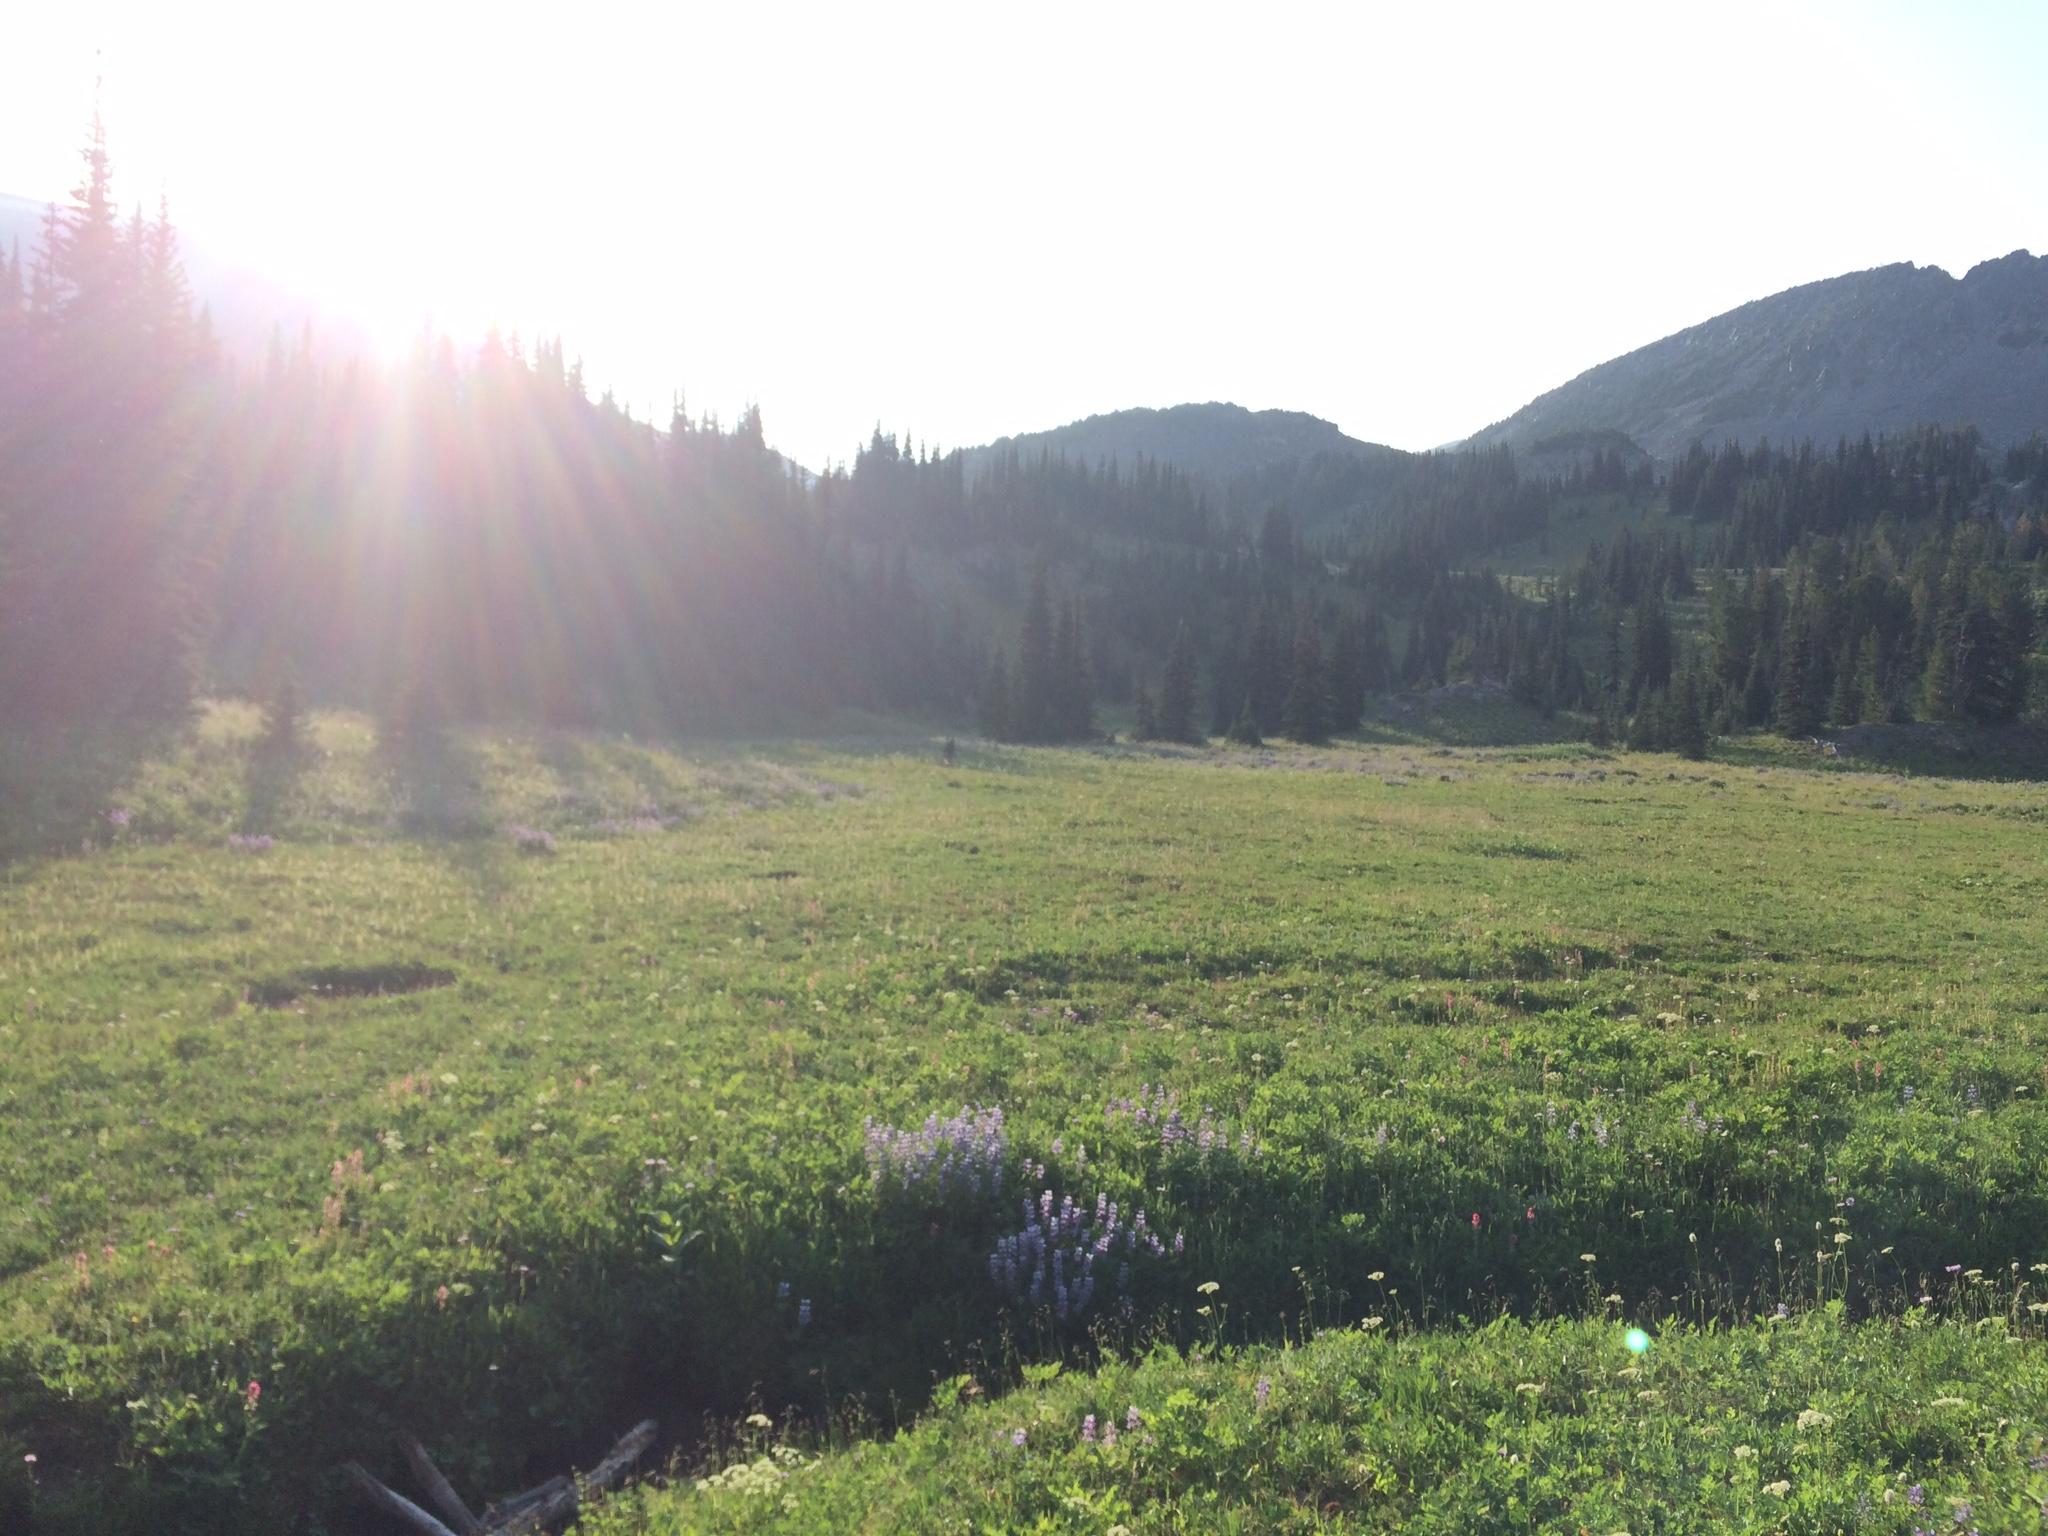 Alpine meadow between Sourdough Ridge and Frozen Lake